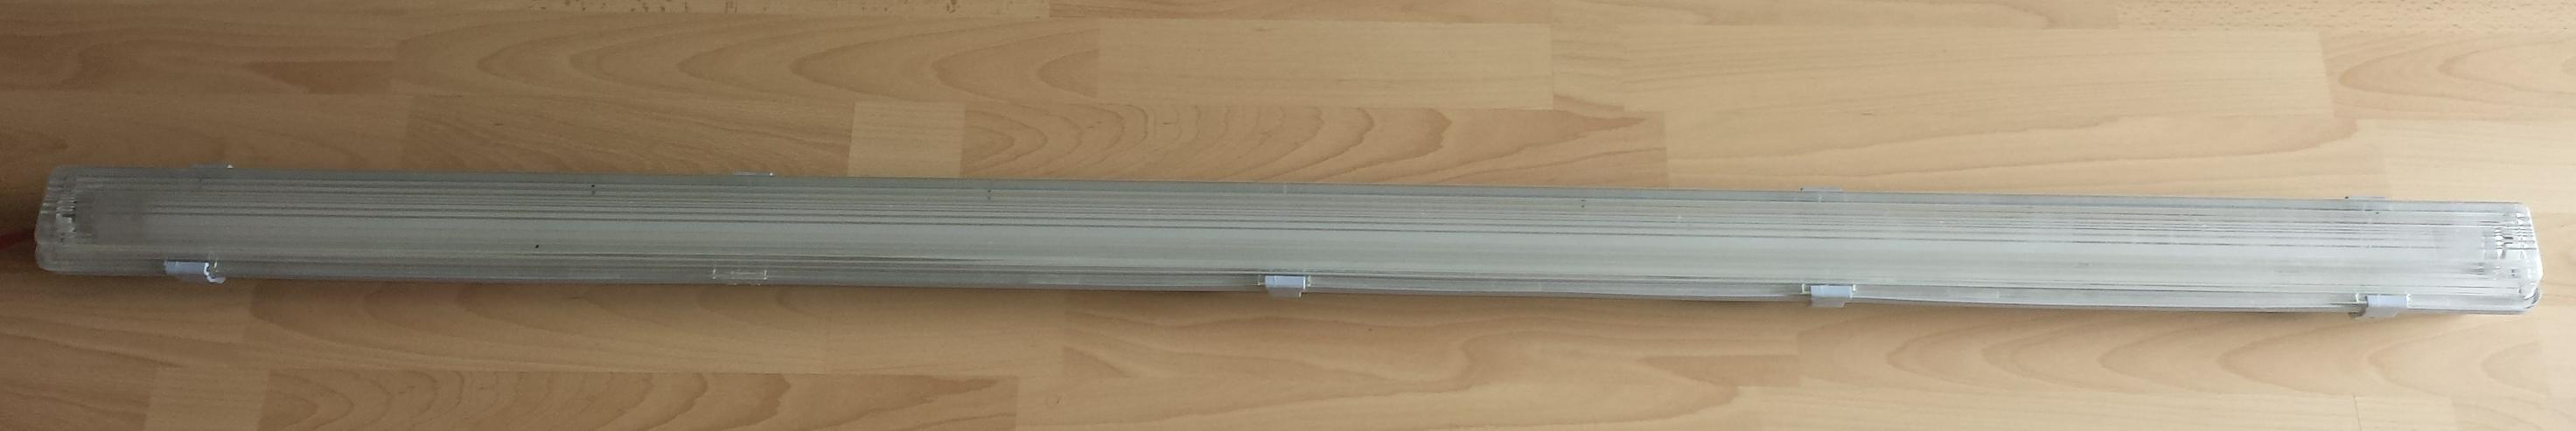 Bild 5: Garagenlampen, Kellerlampen, Röhrenleuchten.